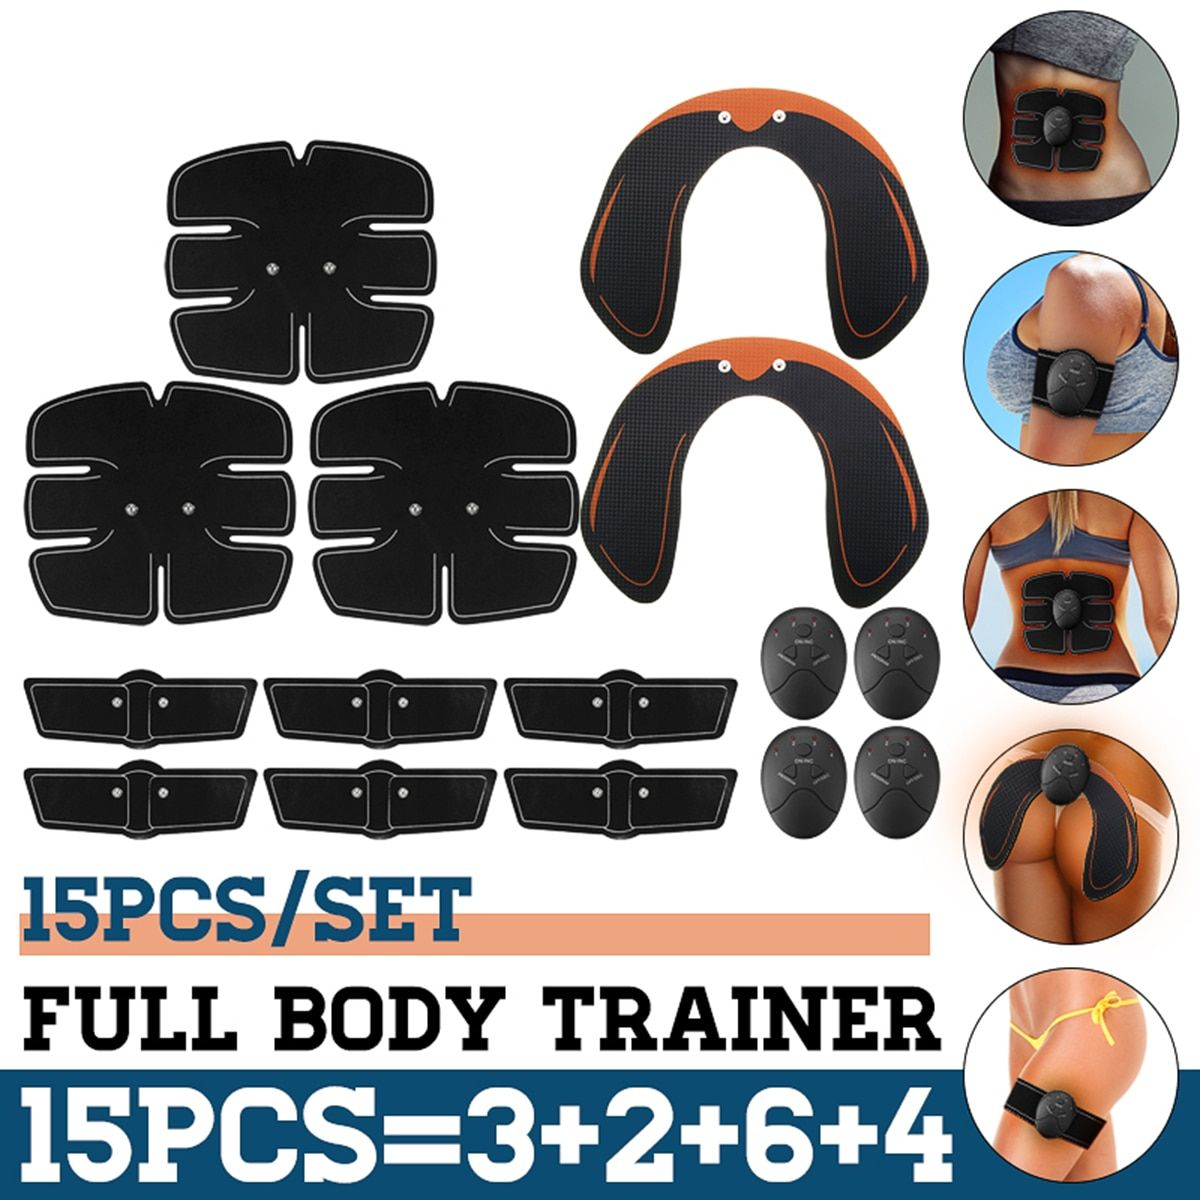 15PCS/Set EMS Muscle Abdominal Trainer Smart Wireless Muscle ABS Hip Abdominal Muscle Stimulator Massage Set Weight Loss